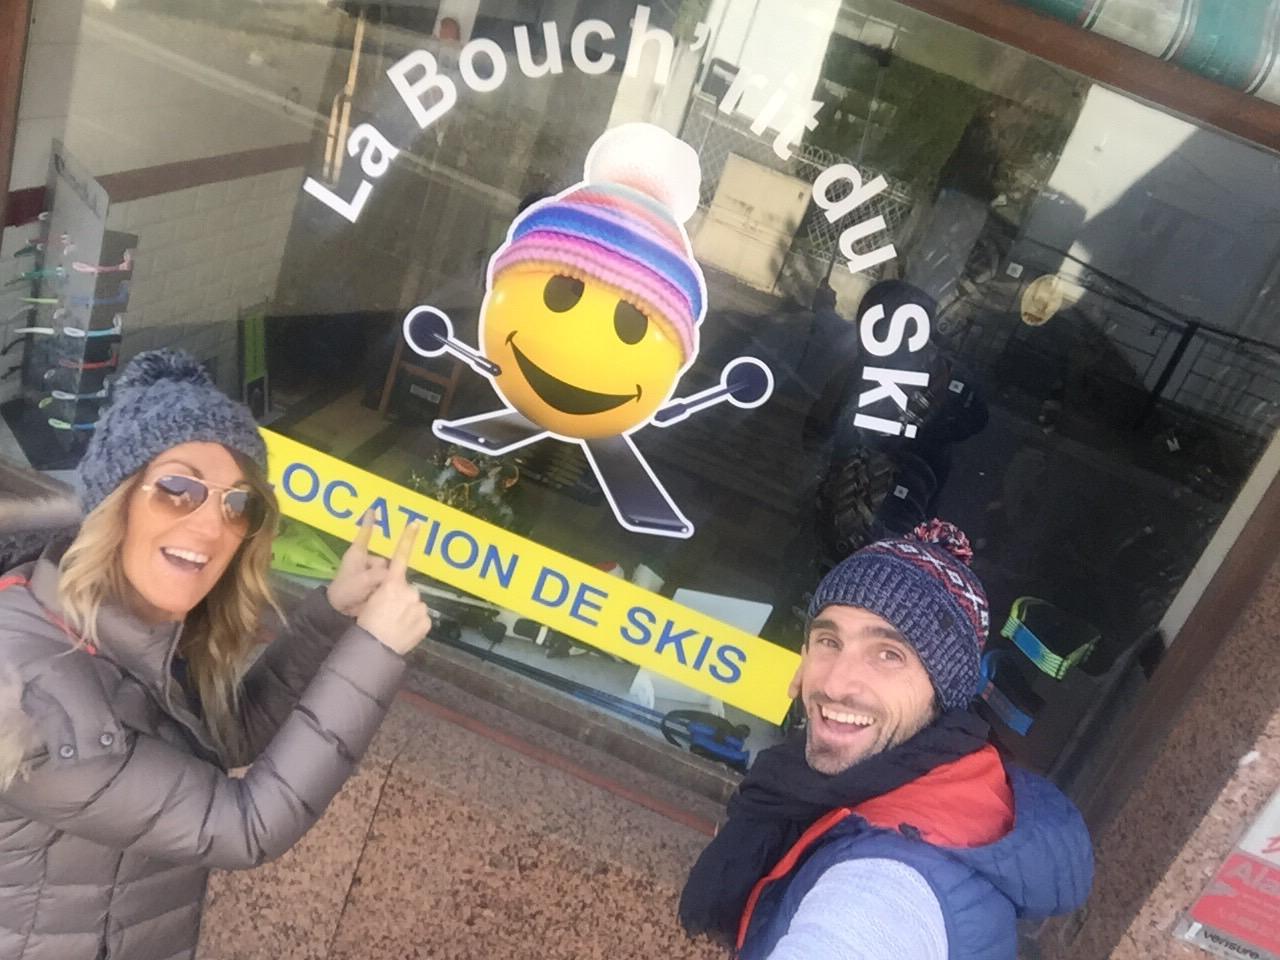 La Bouch'rit du Ski  La Bouch'Rit du ski © Bouch'Rit du ski